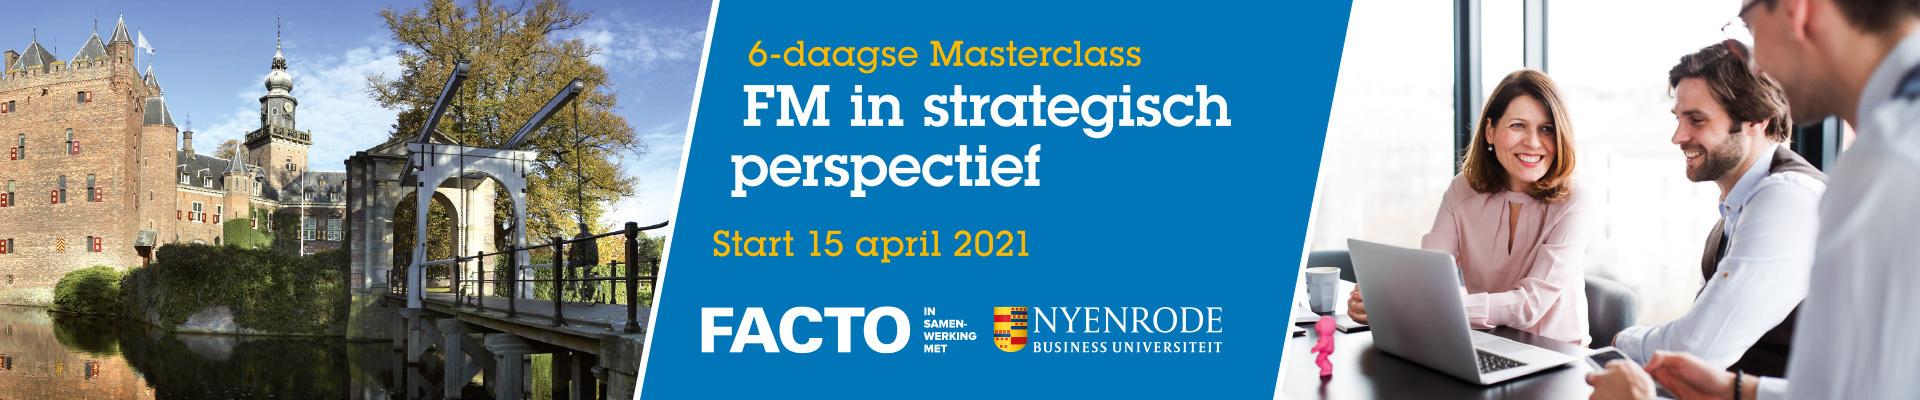 Facto Masterclass FM in strategisch perspectief 2021